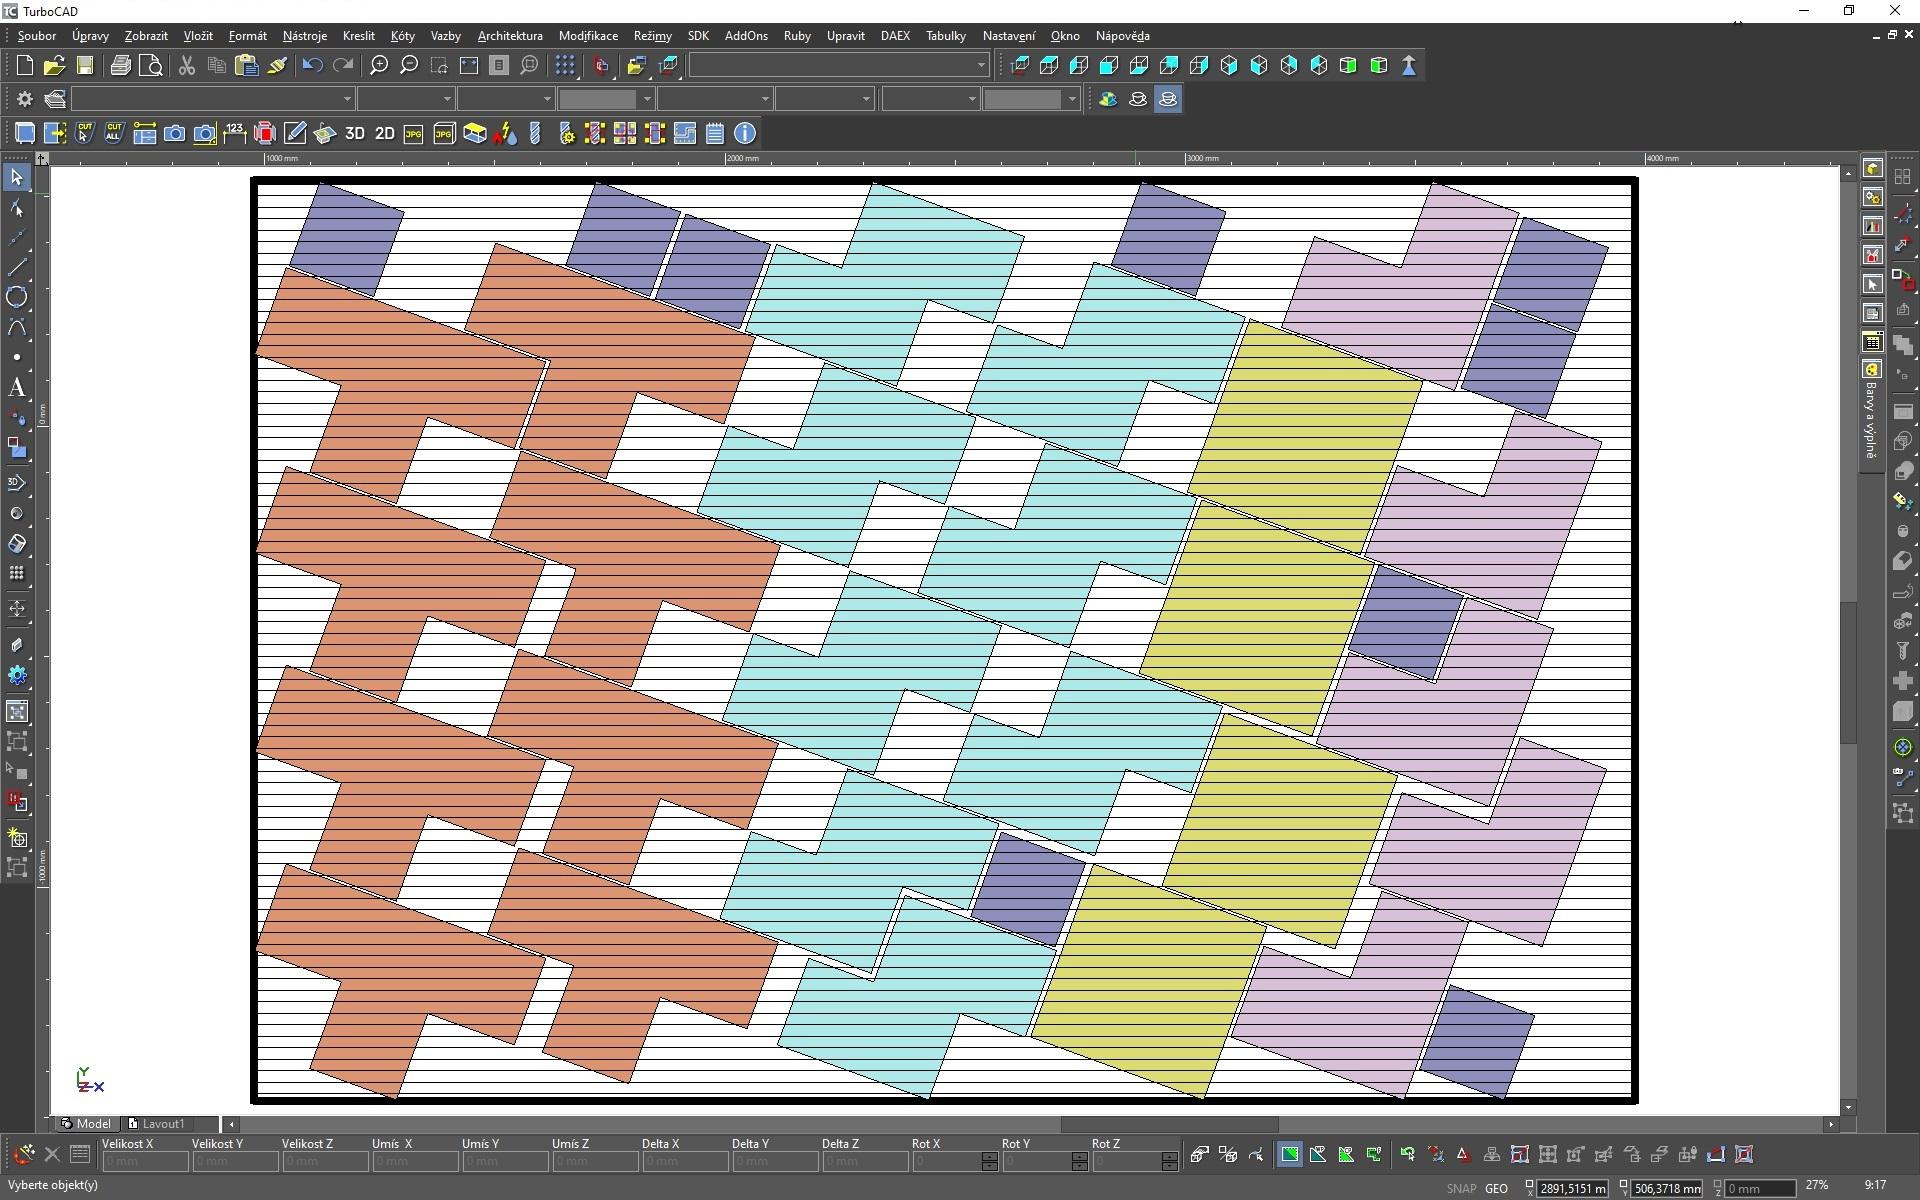 Vysledek20st01 cary - DAEX DESIGN Professional 21